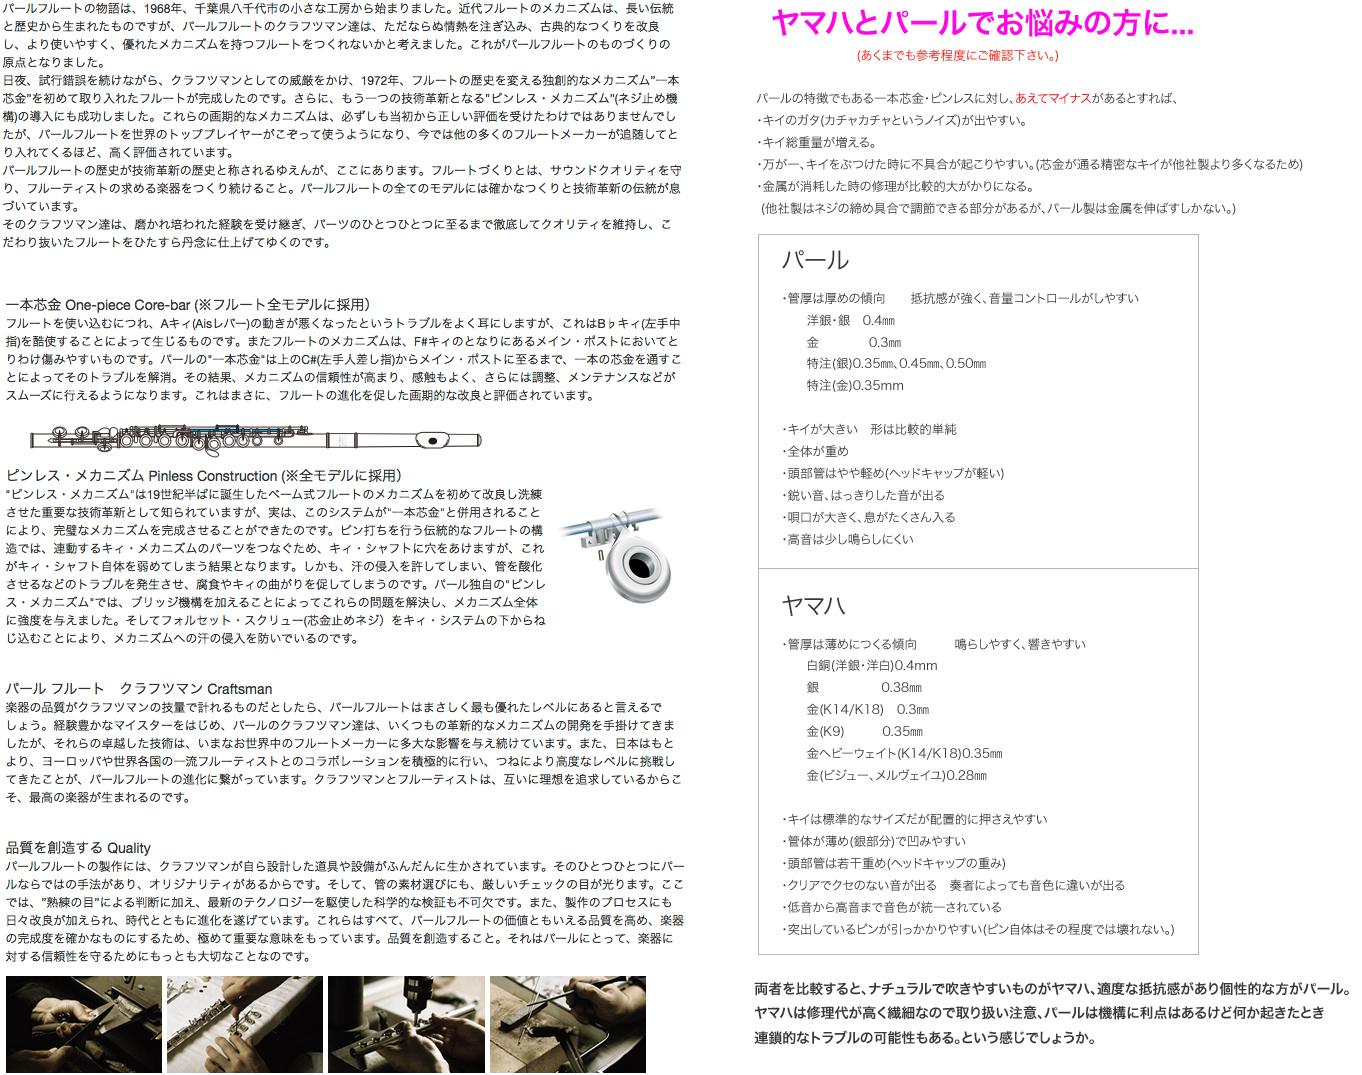 PearlFlute(パールフルート)【予約】PF-505EUSフルートストレート+U字頭部管新品プレストEメカニズム銀メッキ管楽器Presto【PF505EUSセットC】送料無料